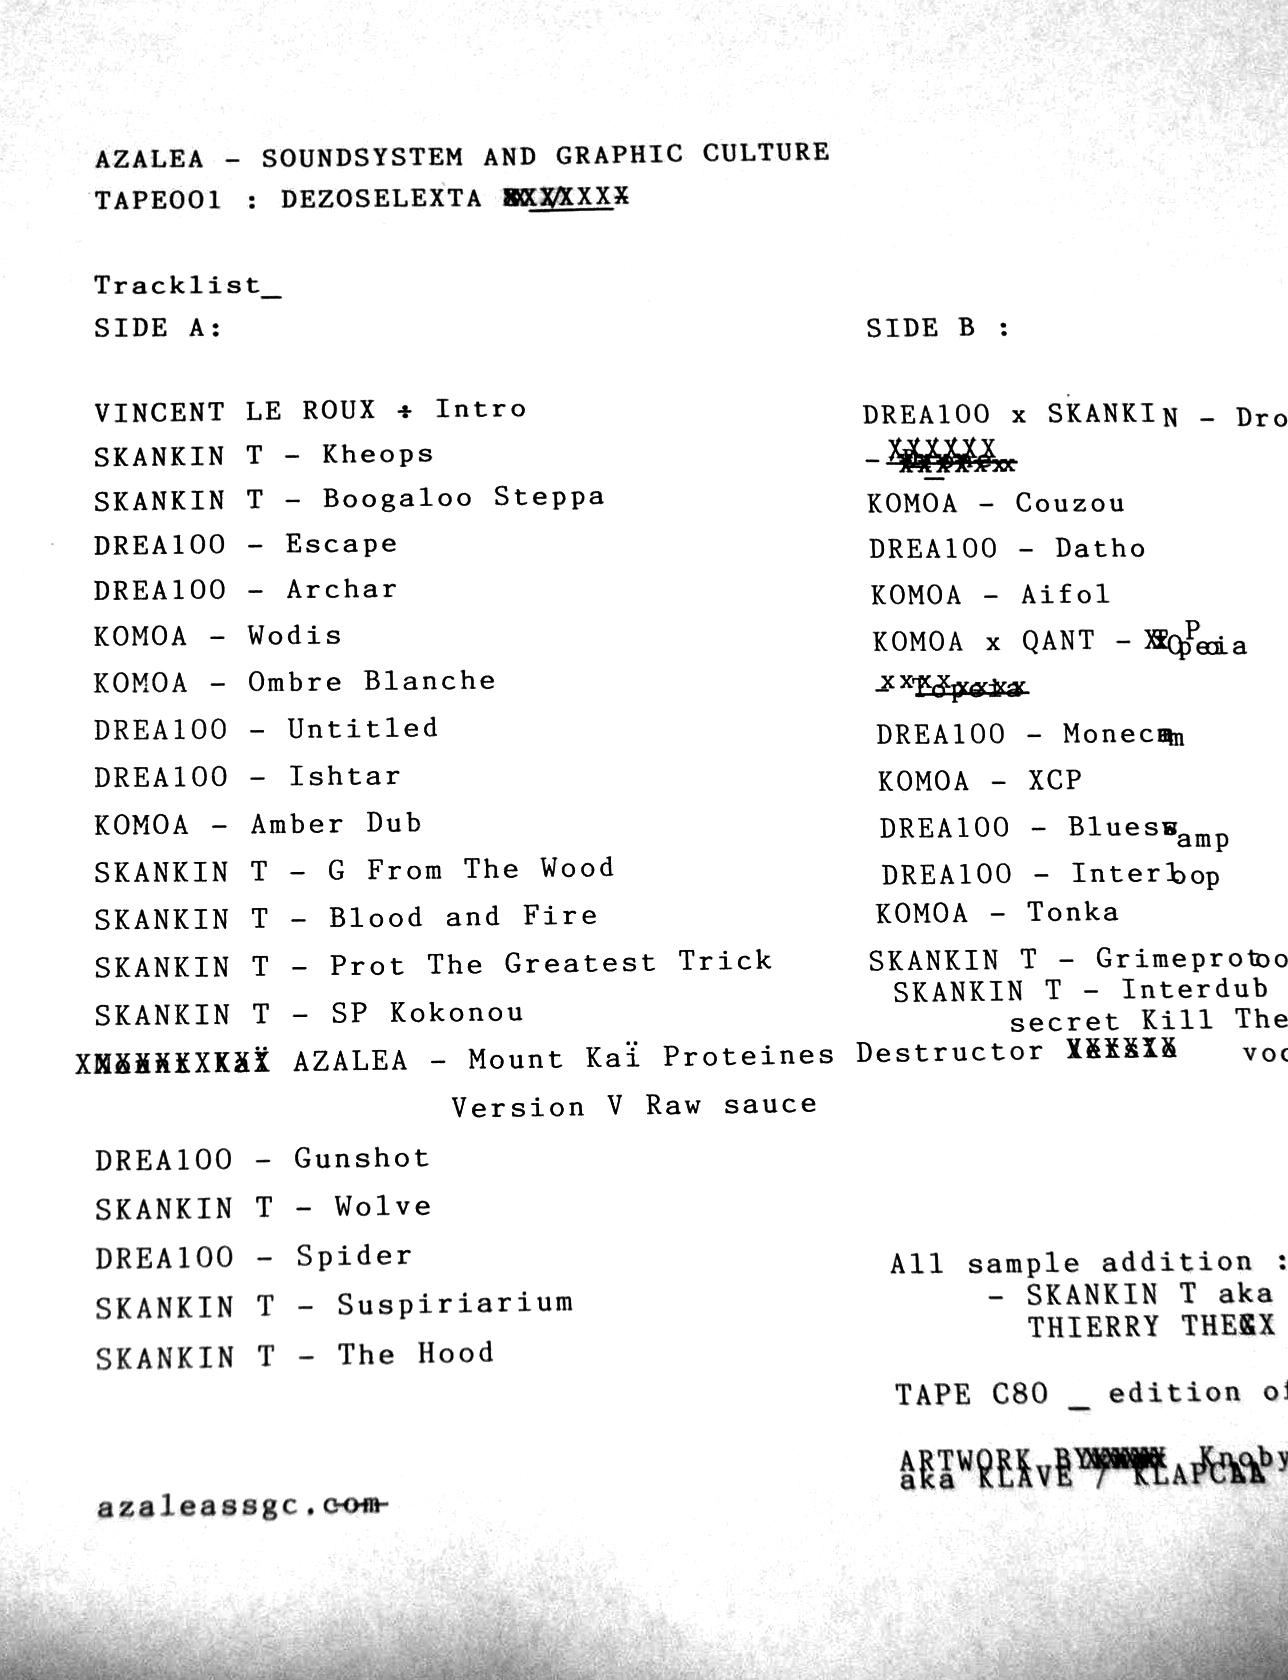 Azalea ssgc Dezoselexta Tracklist K7 001 80 minutes